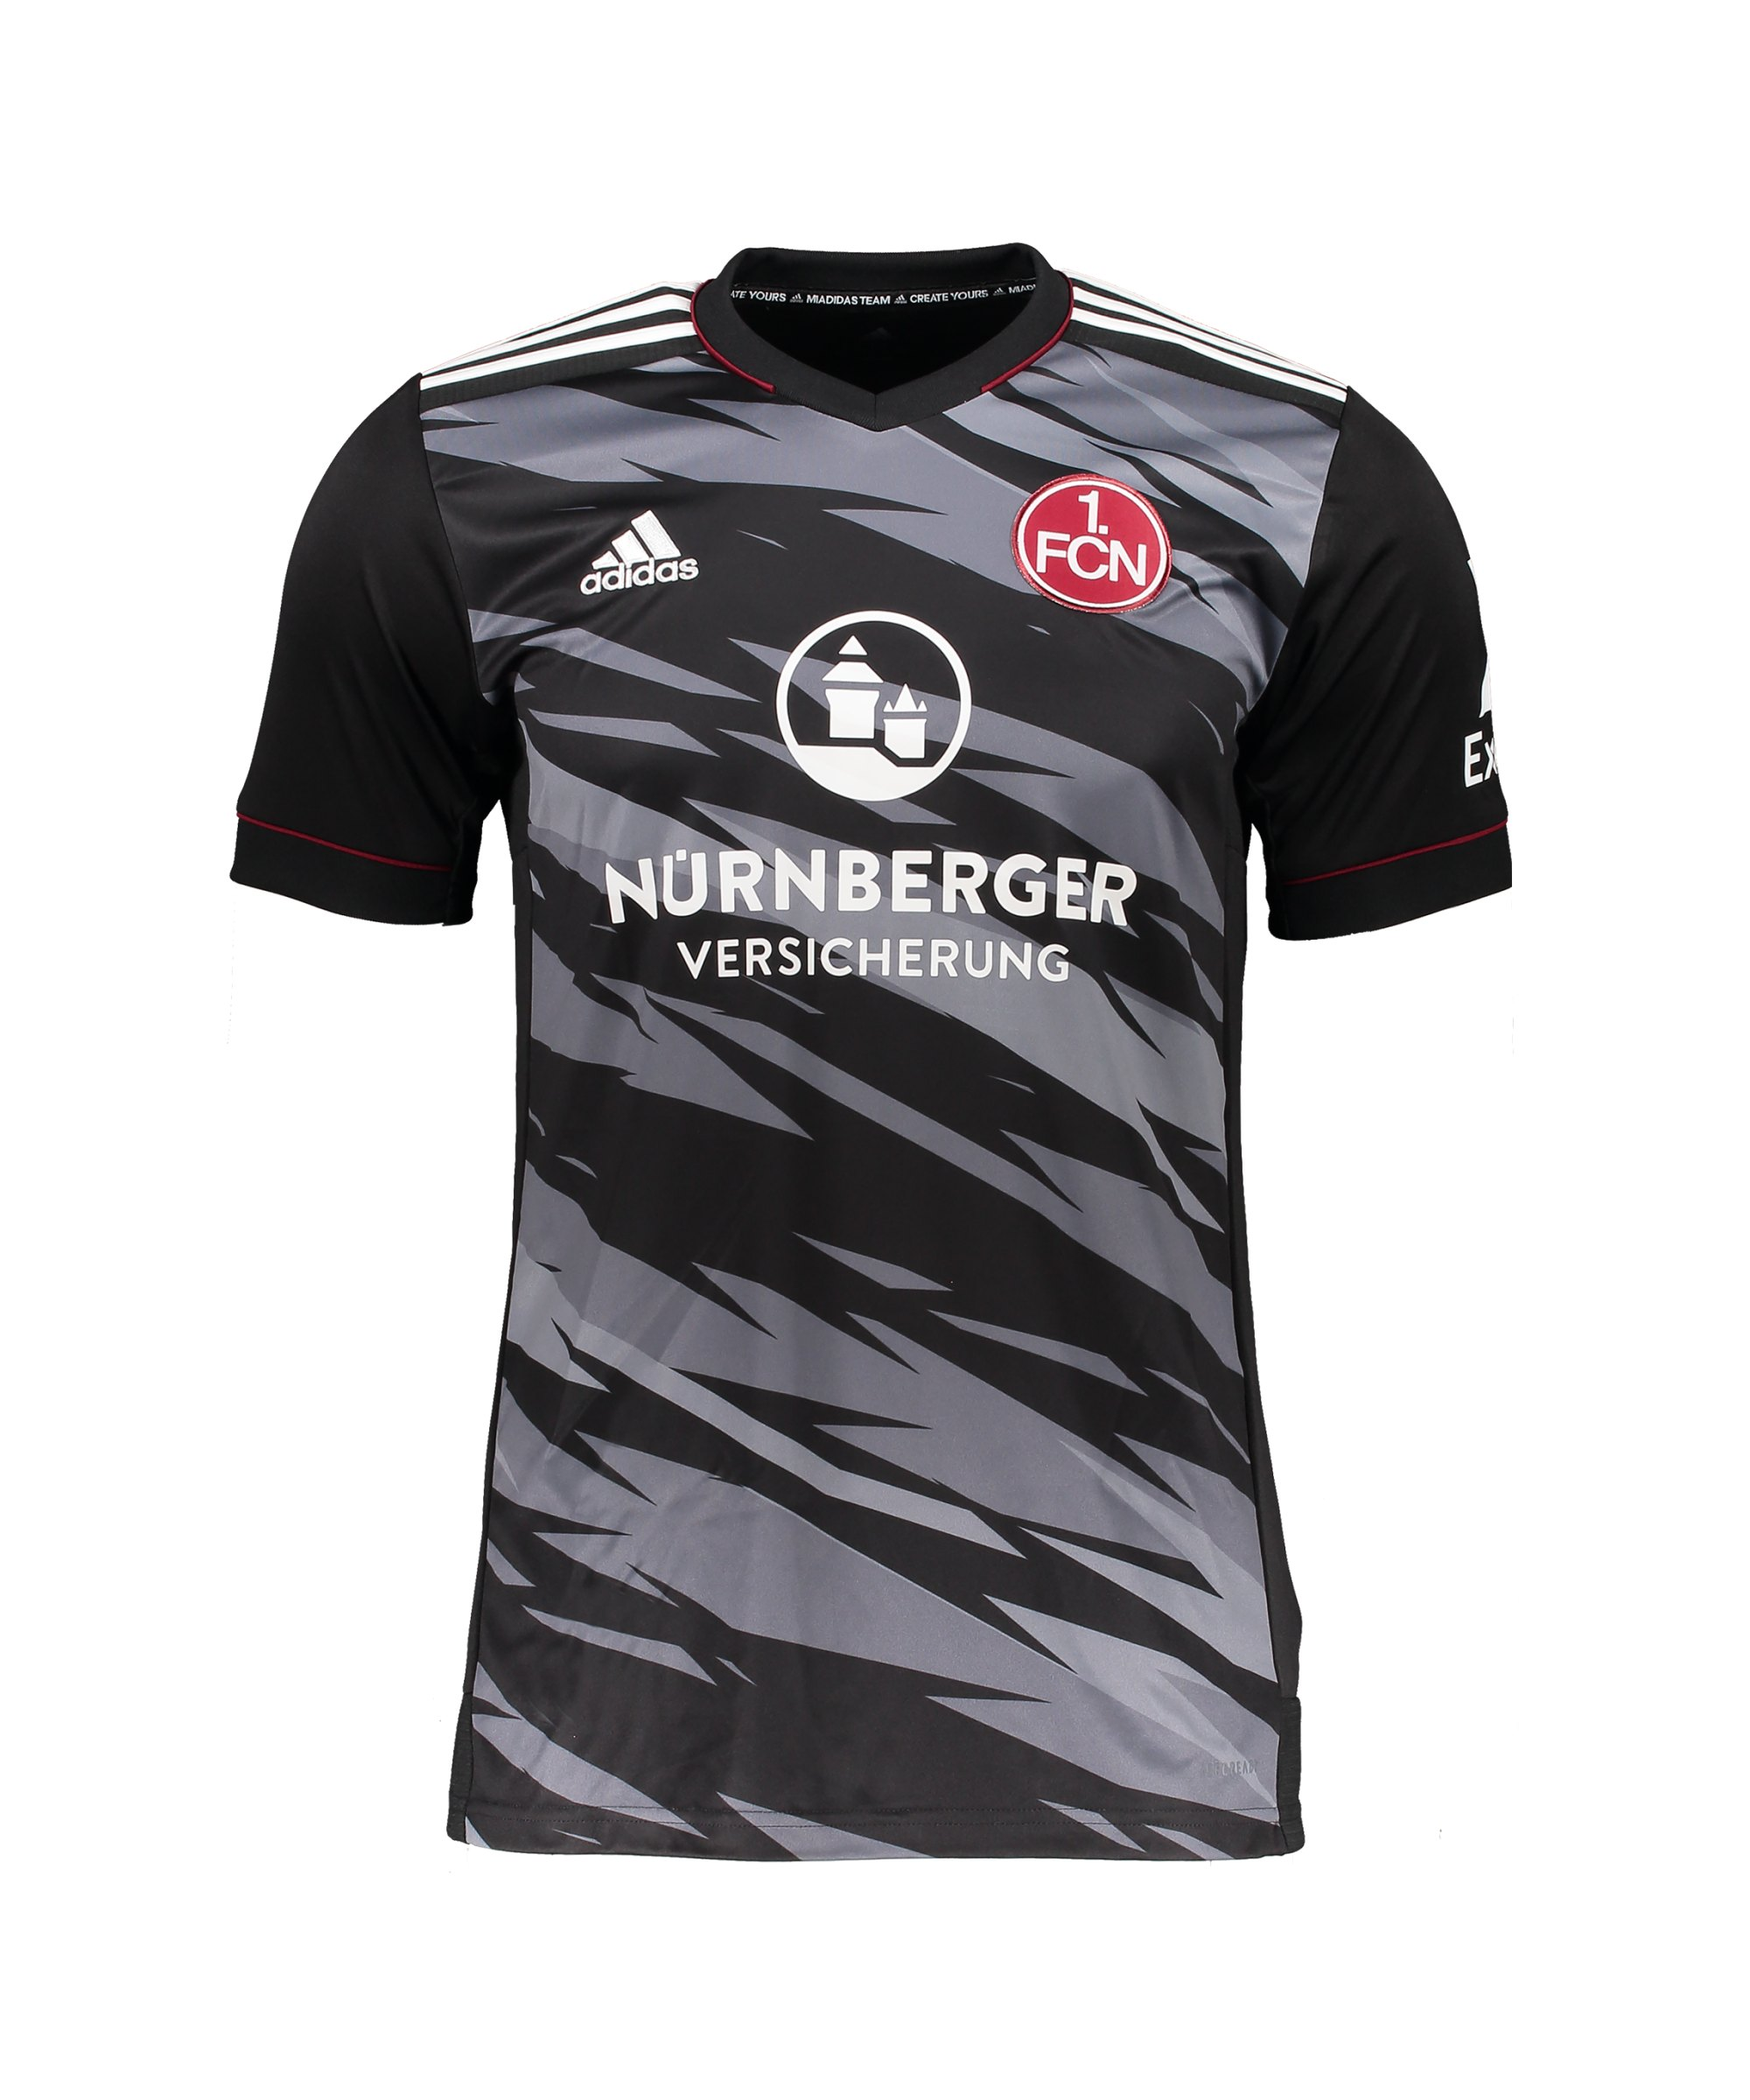 adidas 1. FC Nürnberg Trikot 3rd 2021/2022 Schwarz - schwarz